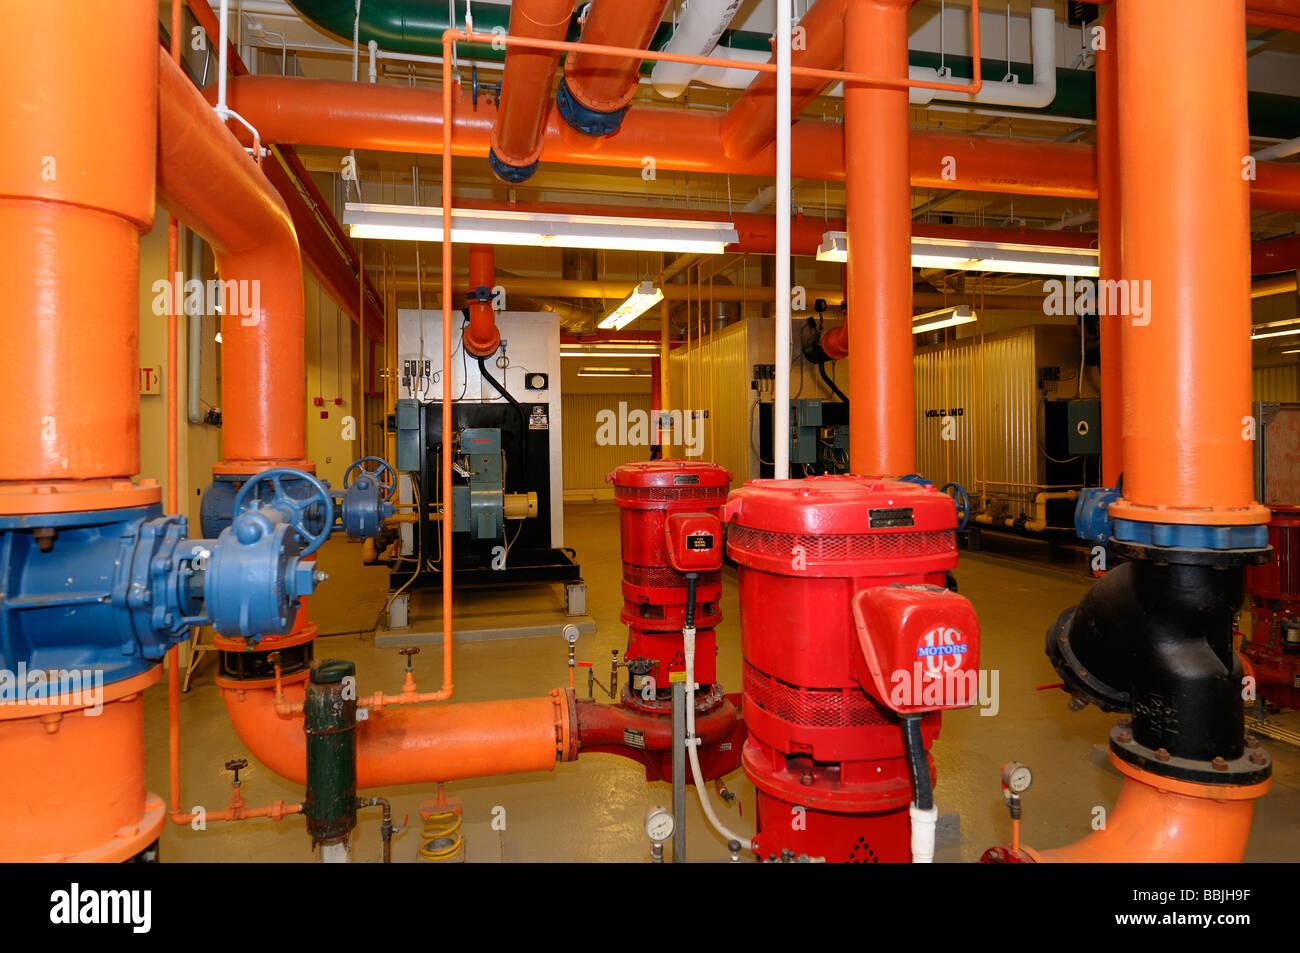 Water Boiler Furnace Stockfotos & Water Boiler Furnace Bilder - Alamy